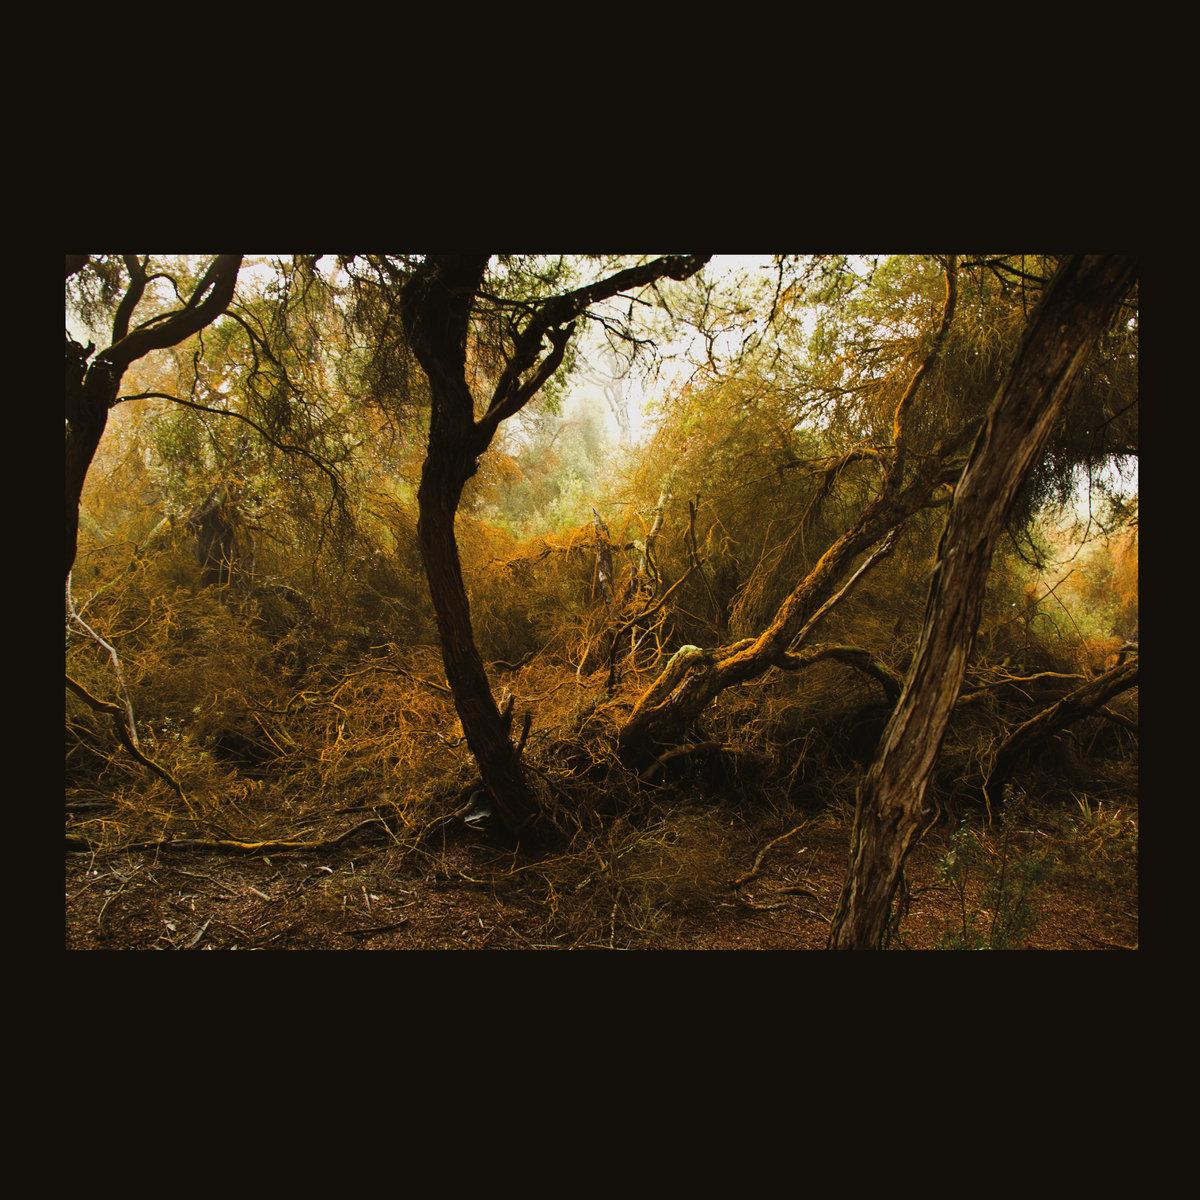 Lubomyr Melnyk ~ FallenTrees